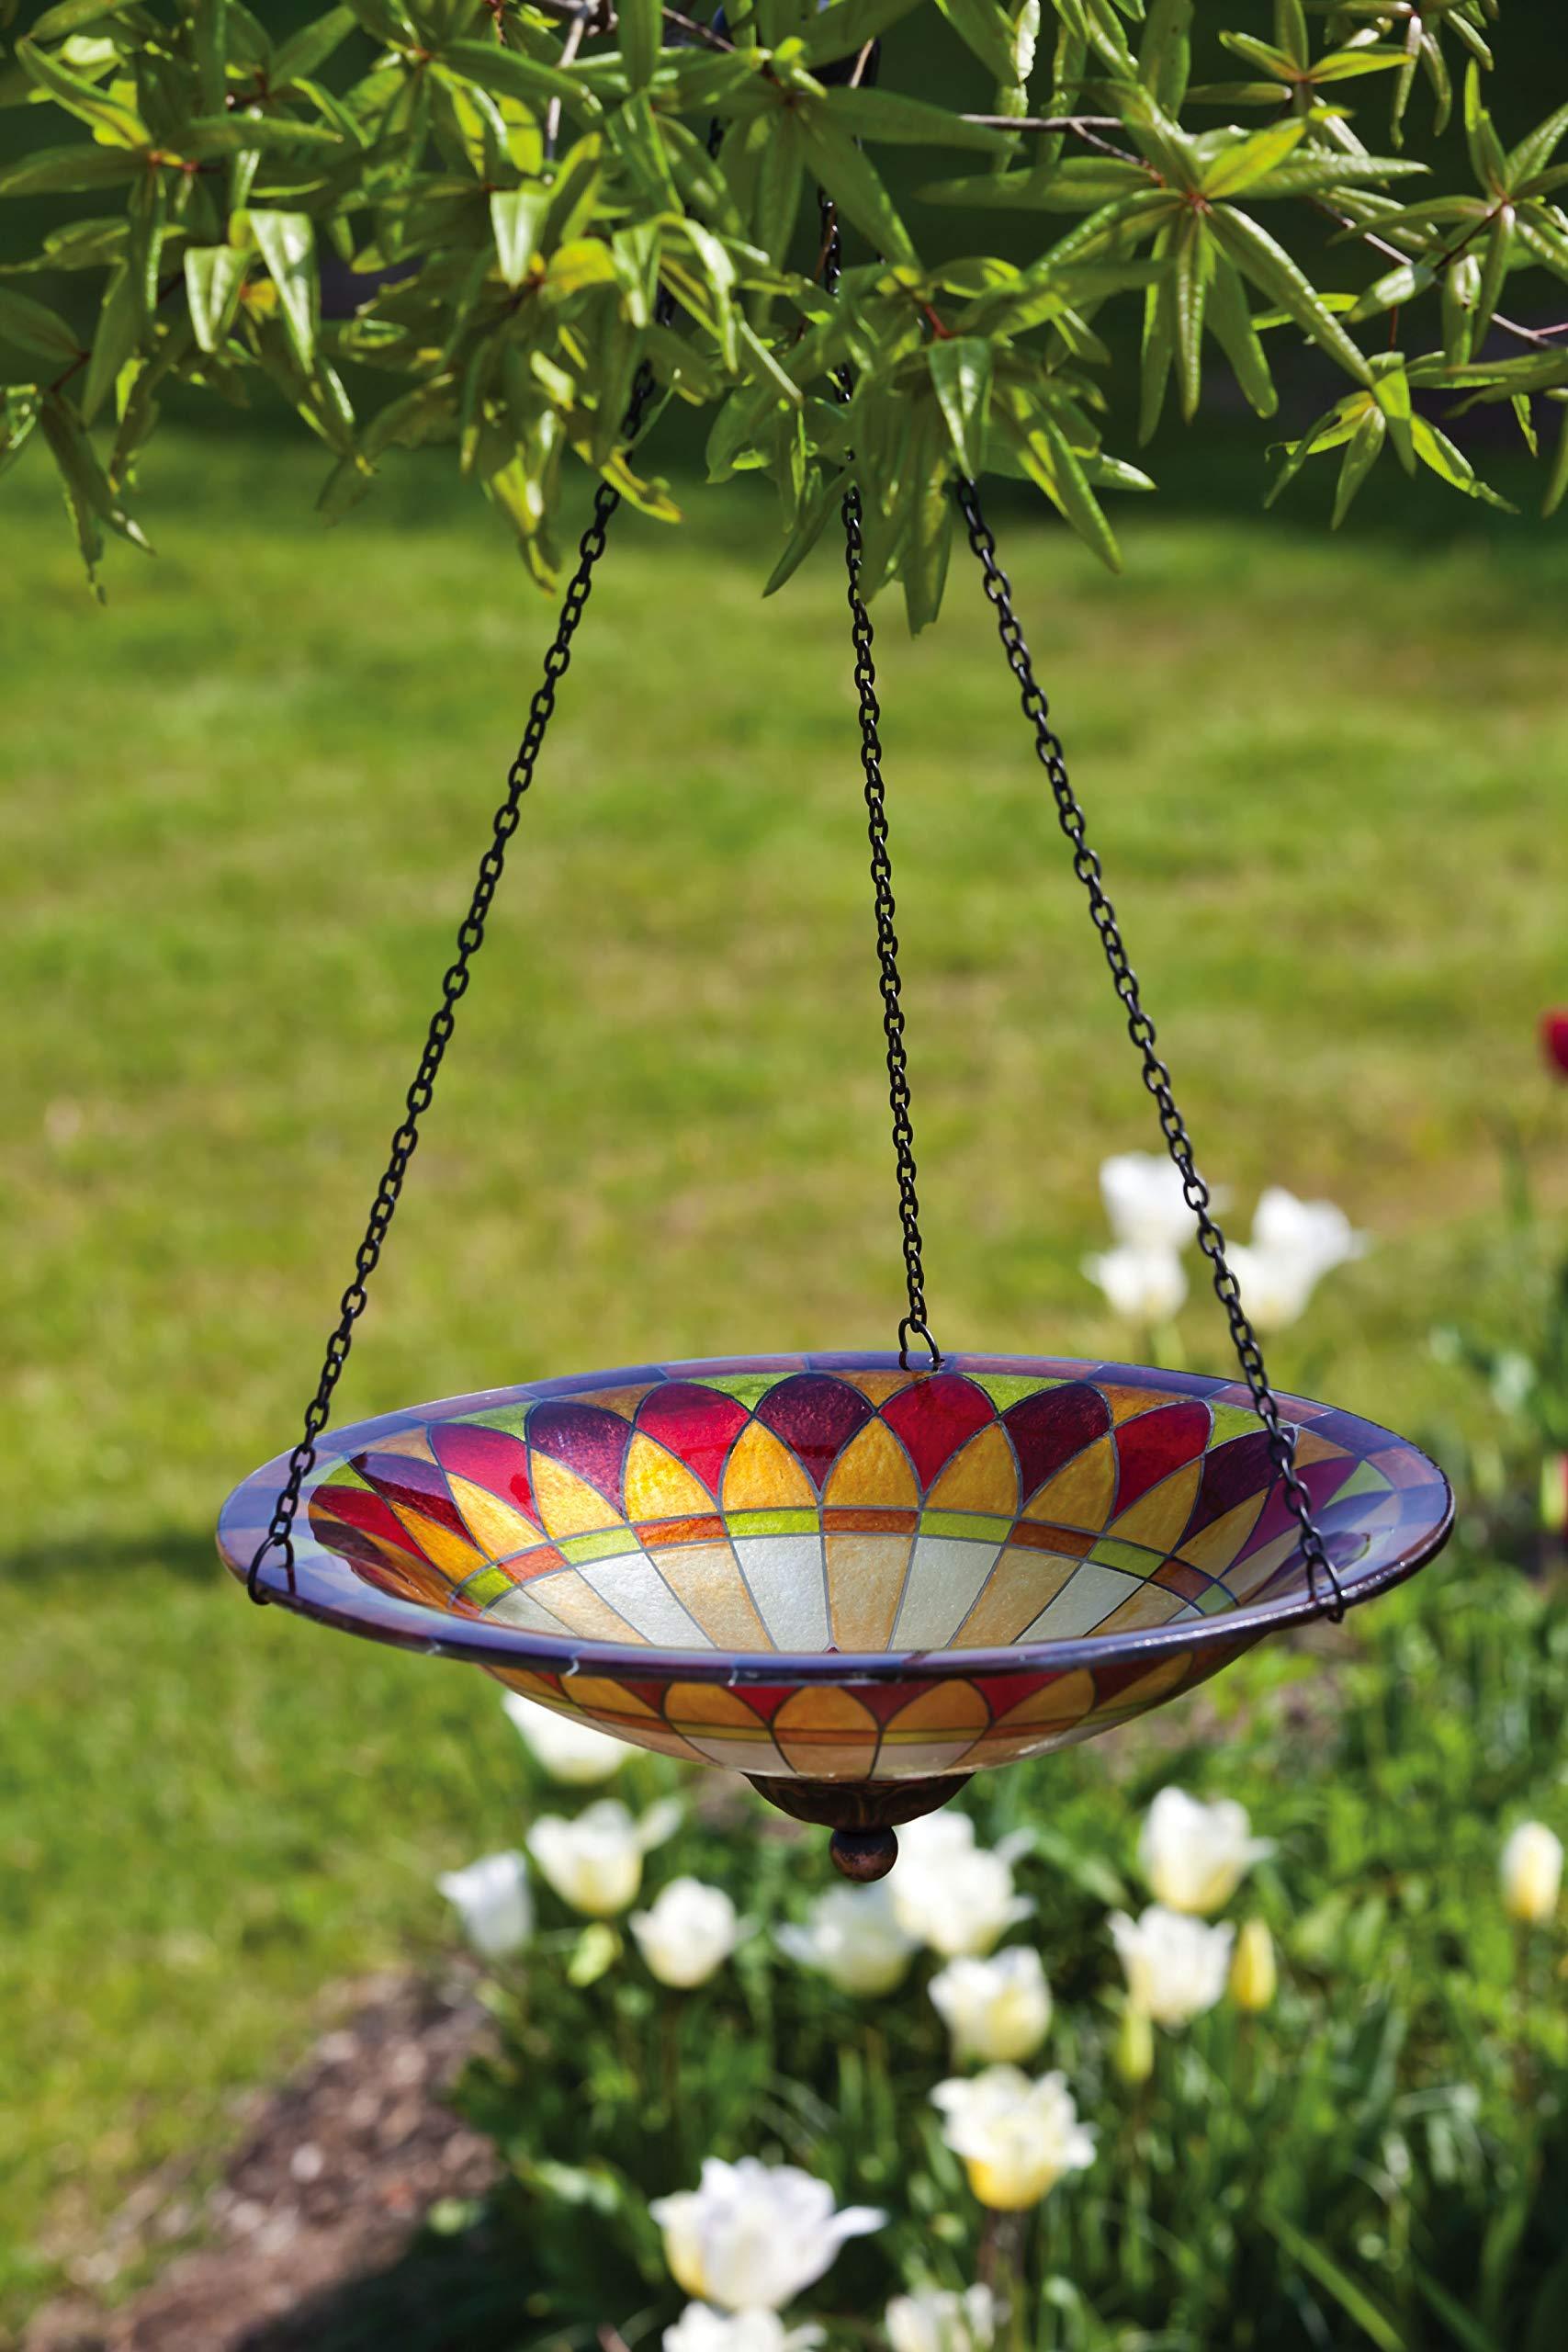 Evergreen Garden Tiffany-Inspired Hanging Glass Bird Bath Bowl - 13.5''L x 13.5'' W x 22.75'' H